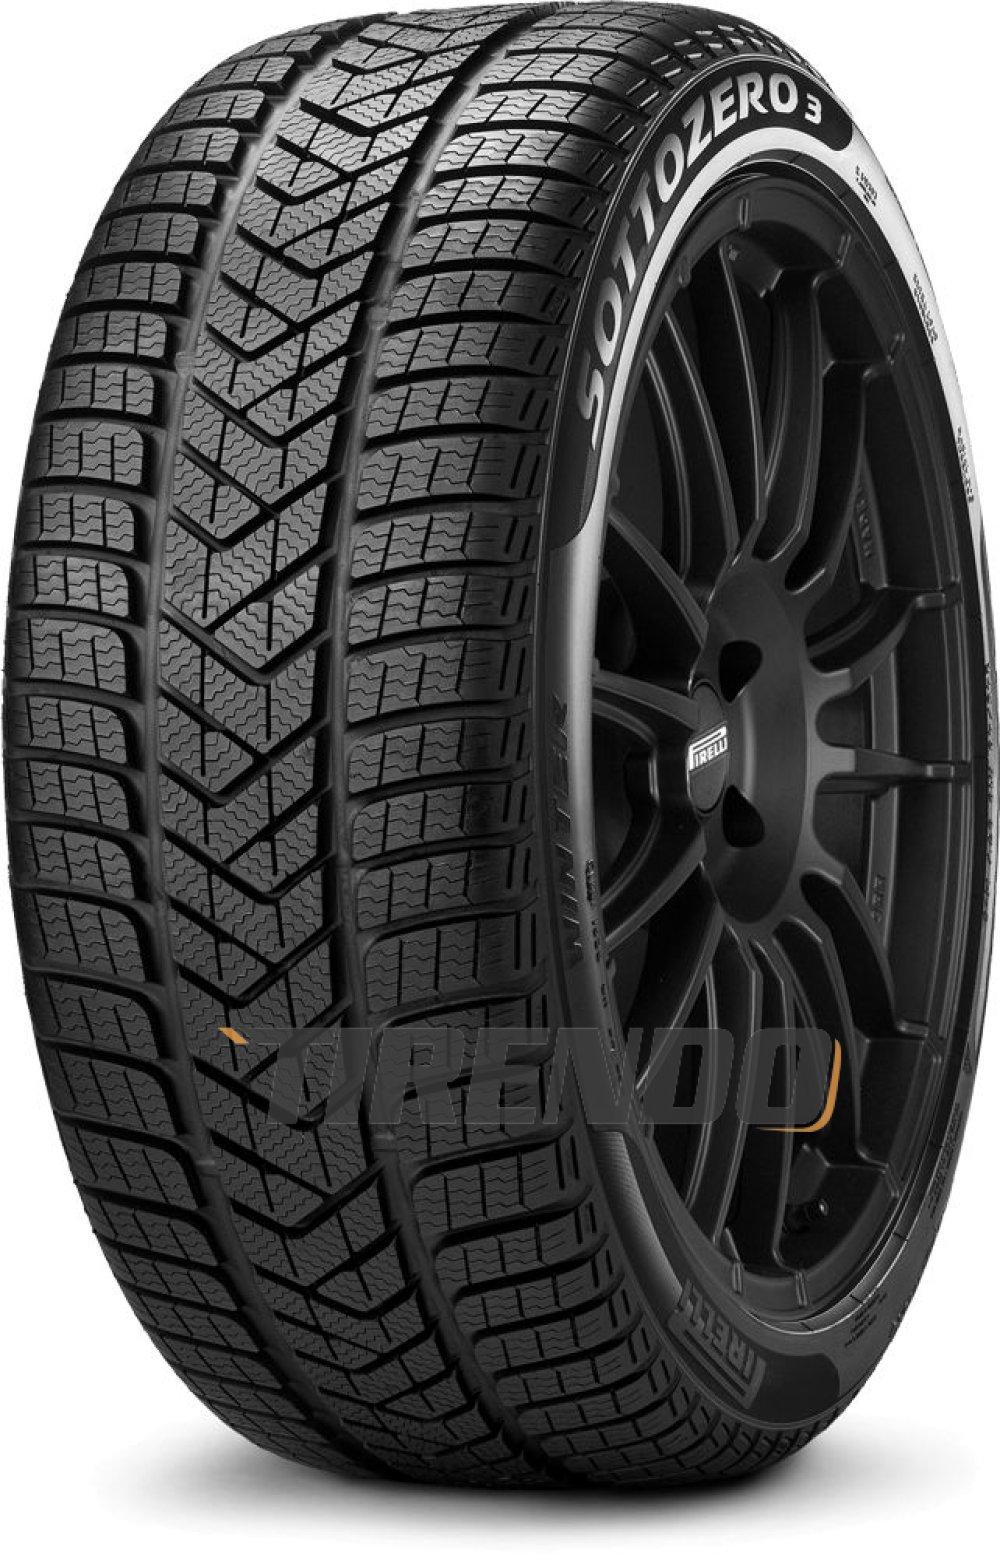 Pirelli Winter SottoZero 3 runflat ( 255/35 R19 96H XL , runflat )